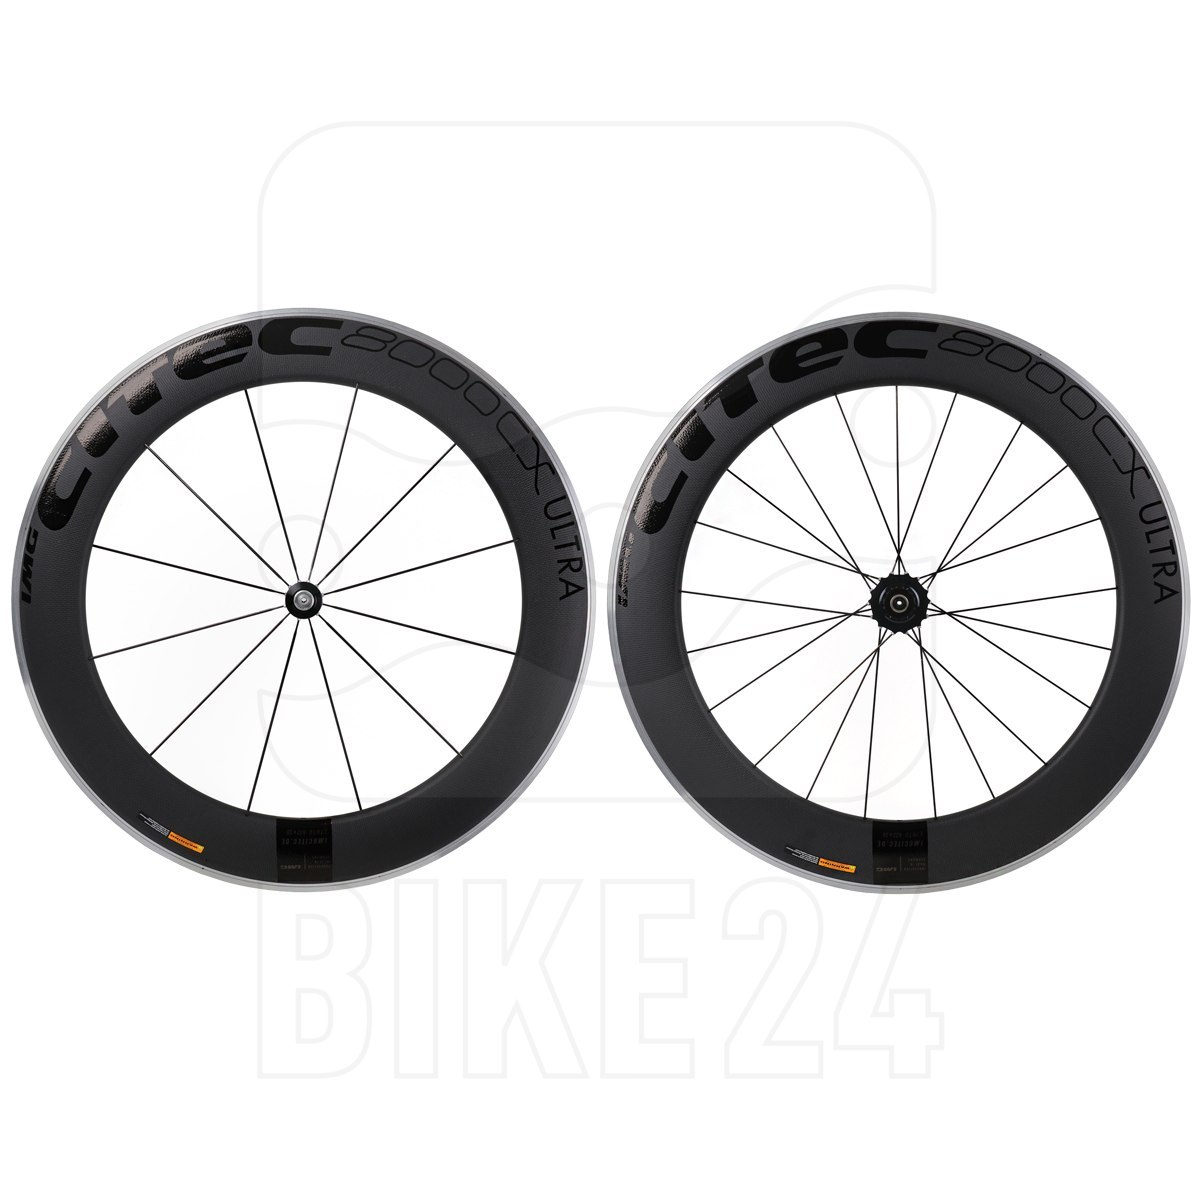 CITEC 8000 CX / 80 Ultra Carbon 28 Inch Wheelset - Clincher - FW: 9x100mm QR   RW: 10x130mm QR - black